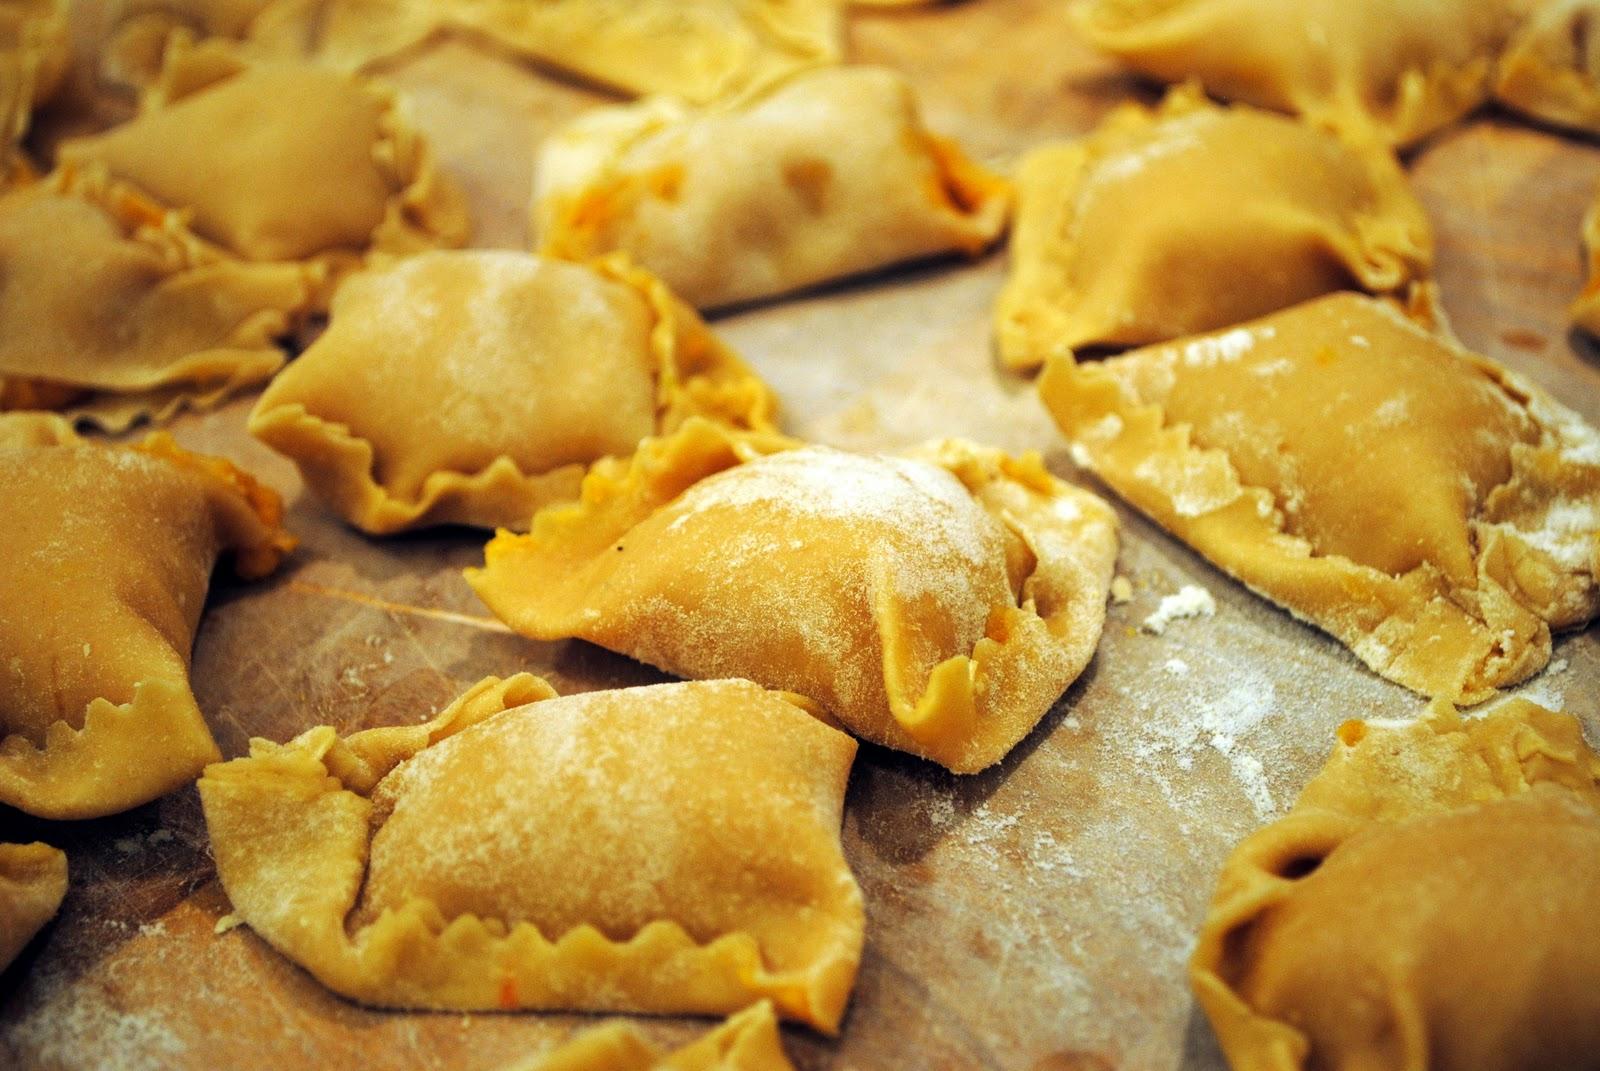 Italian cooking january 2015 for Cooking italian food